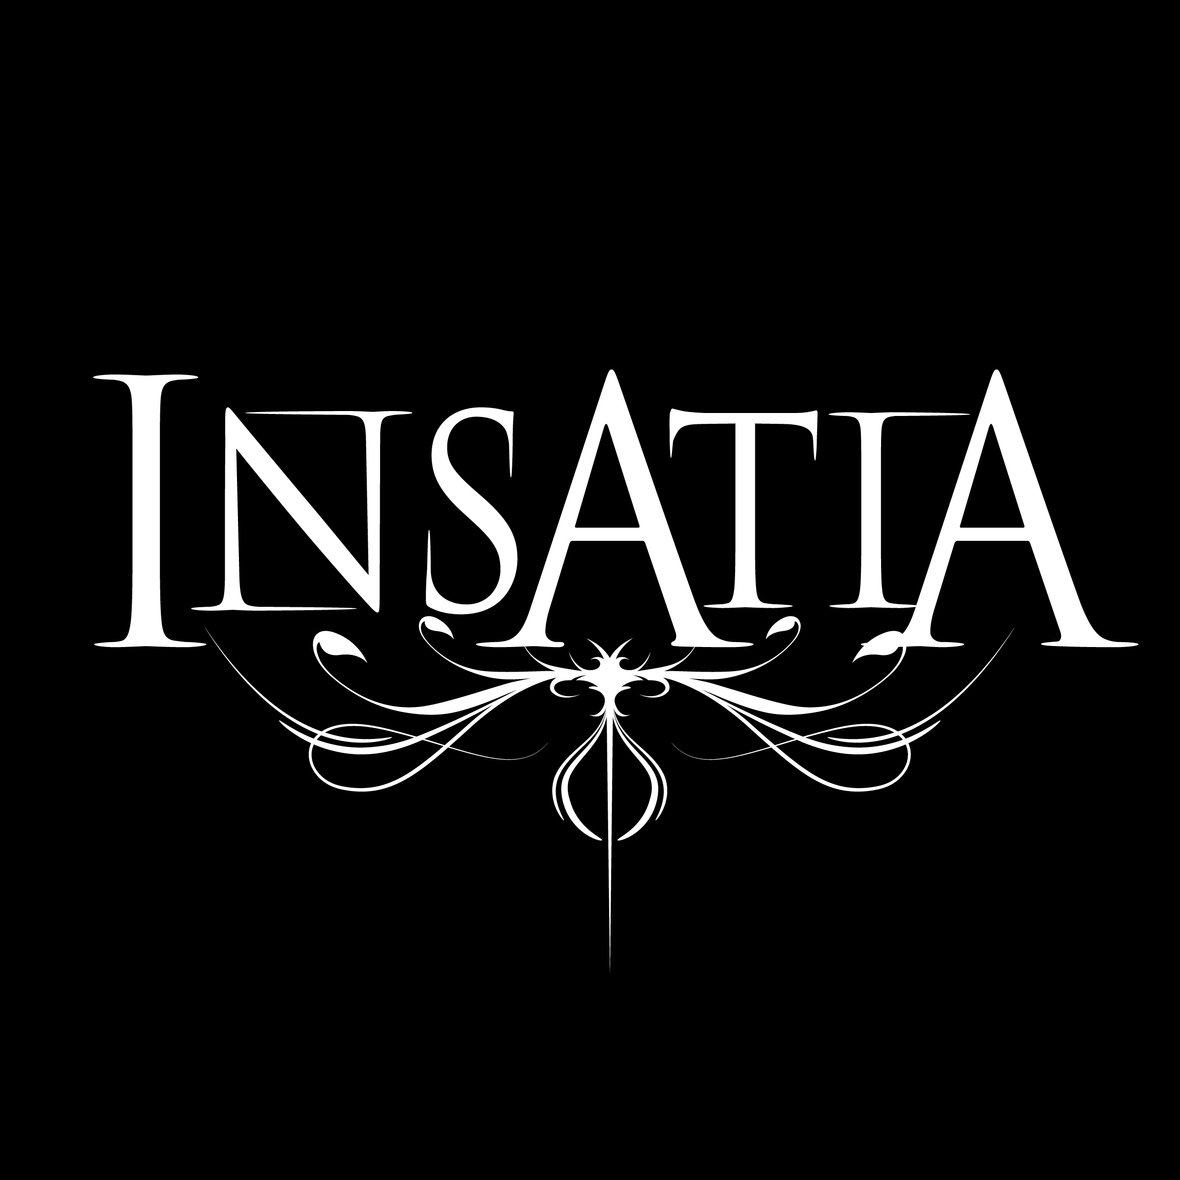 Insatia - Logo